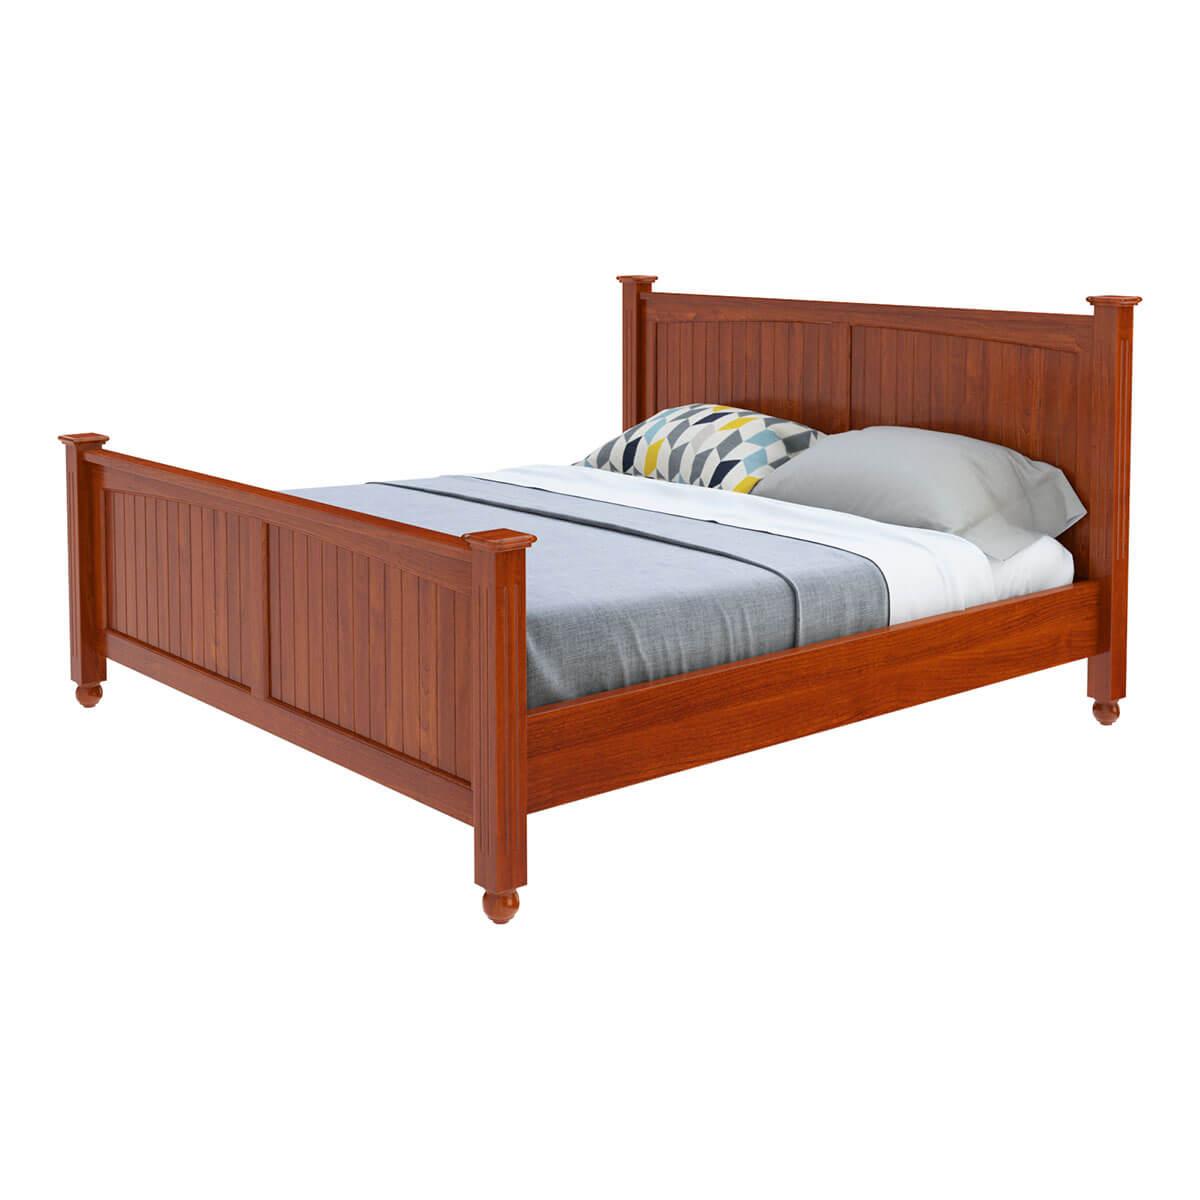 Delanson Solid Mahogany Wood 6 Piece Full Size Bedroom Set